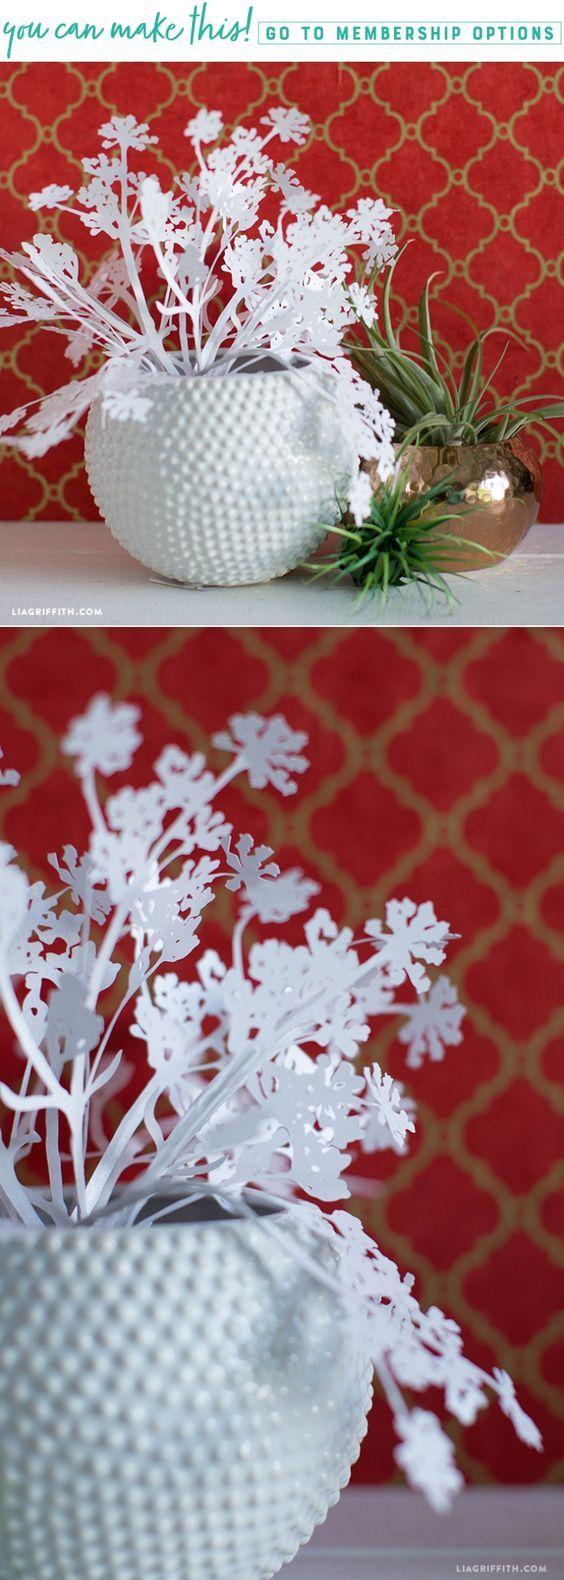 DIY Papercut Queen Anne's Lace - www.LiaGriffith.com - #crcitumaker #cricutmade #cricutcut #officialCricut #paperflowers #paperfoliage